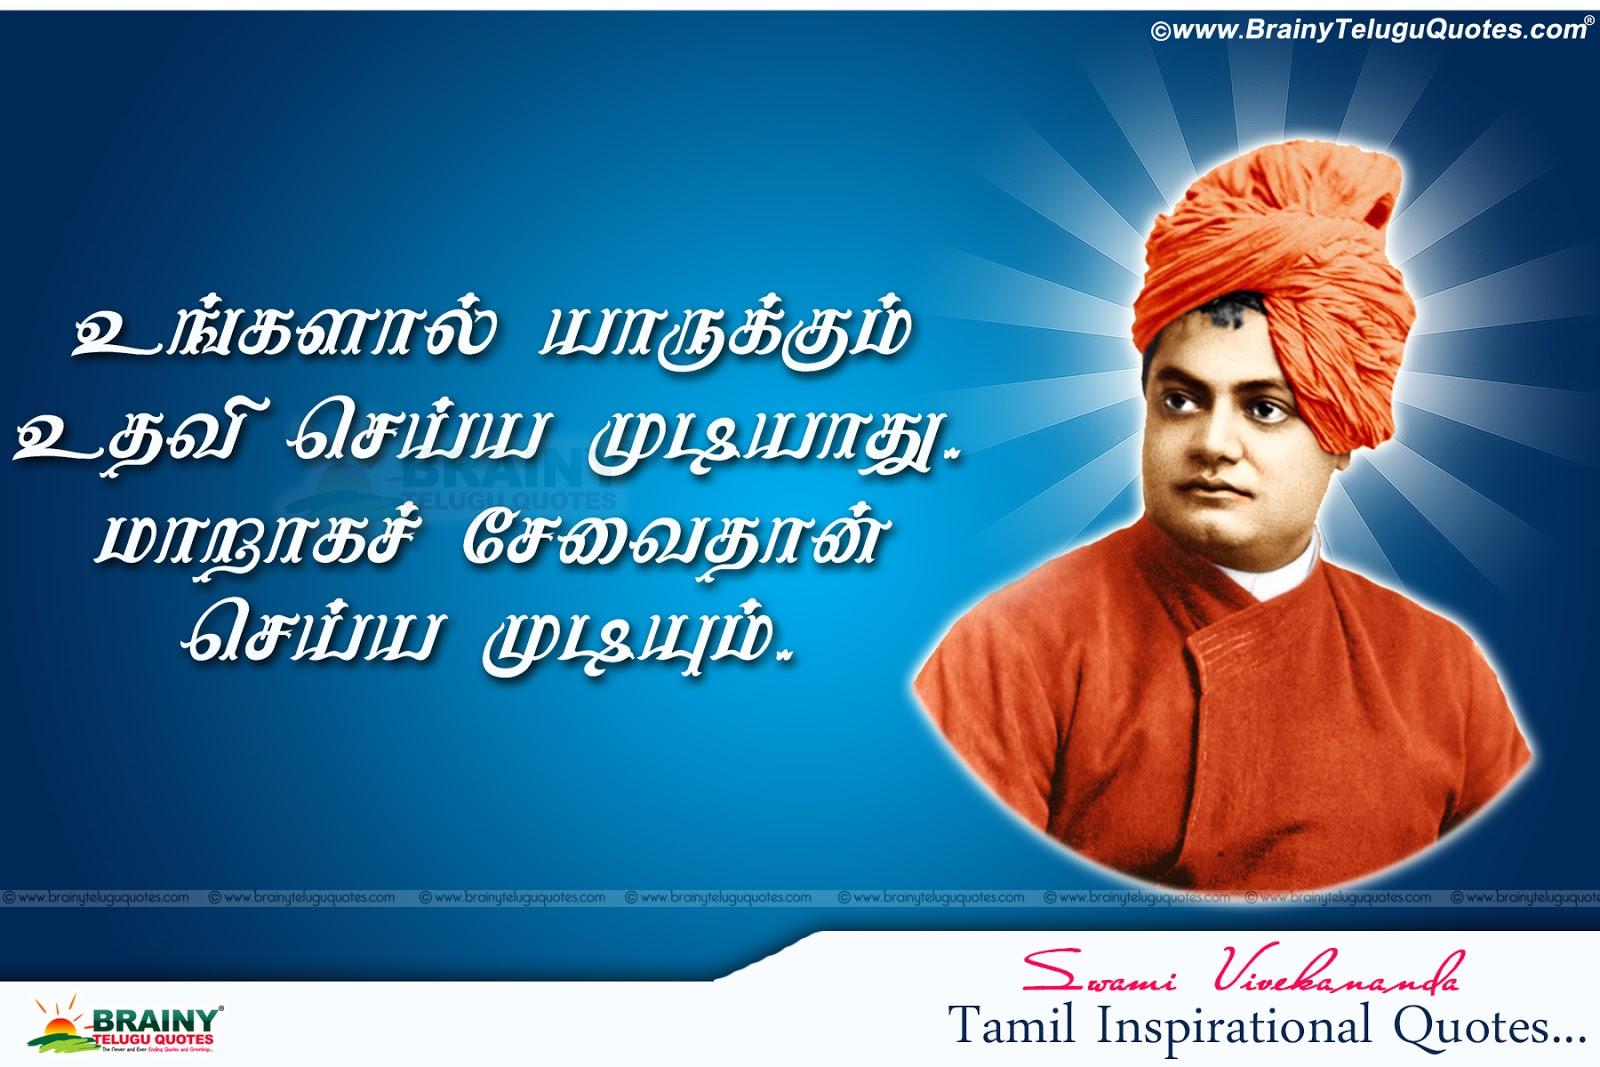 ... .comTelugu quotes|English quotes|Hindi quotes|Tamil quotes|Greetings